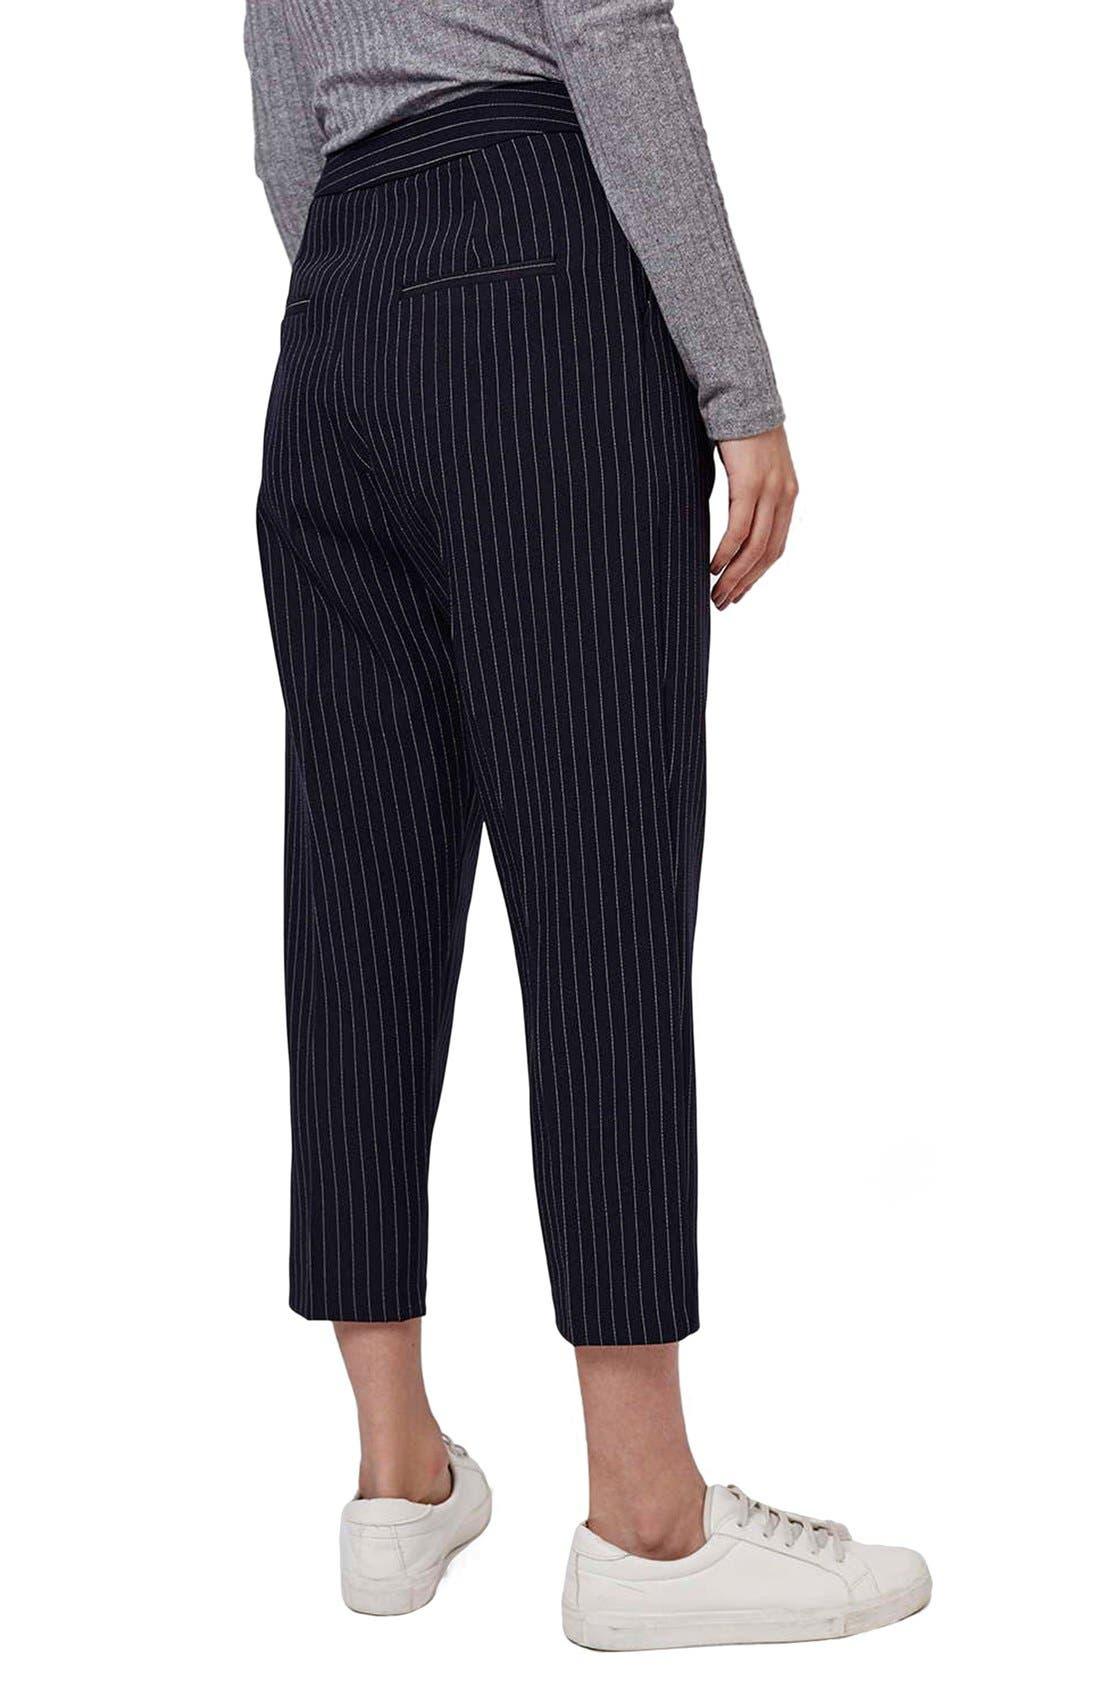 Alternate Image 2  - Topshop Pinstripe Crop Trousers (Petite)